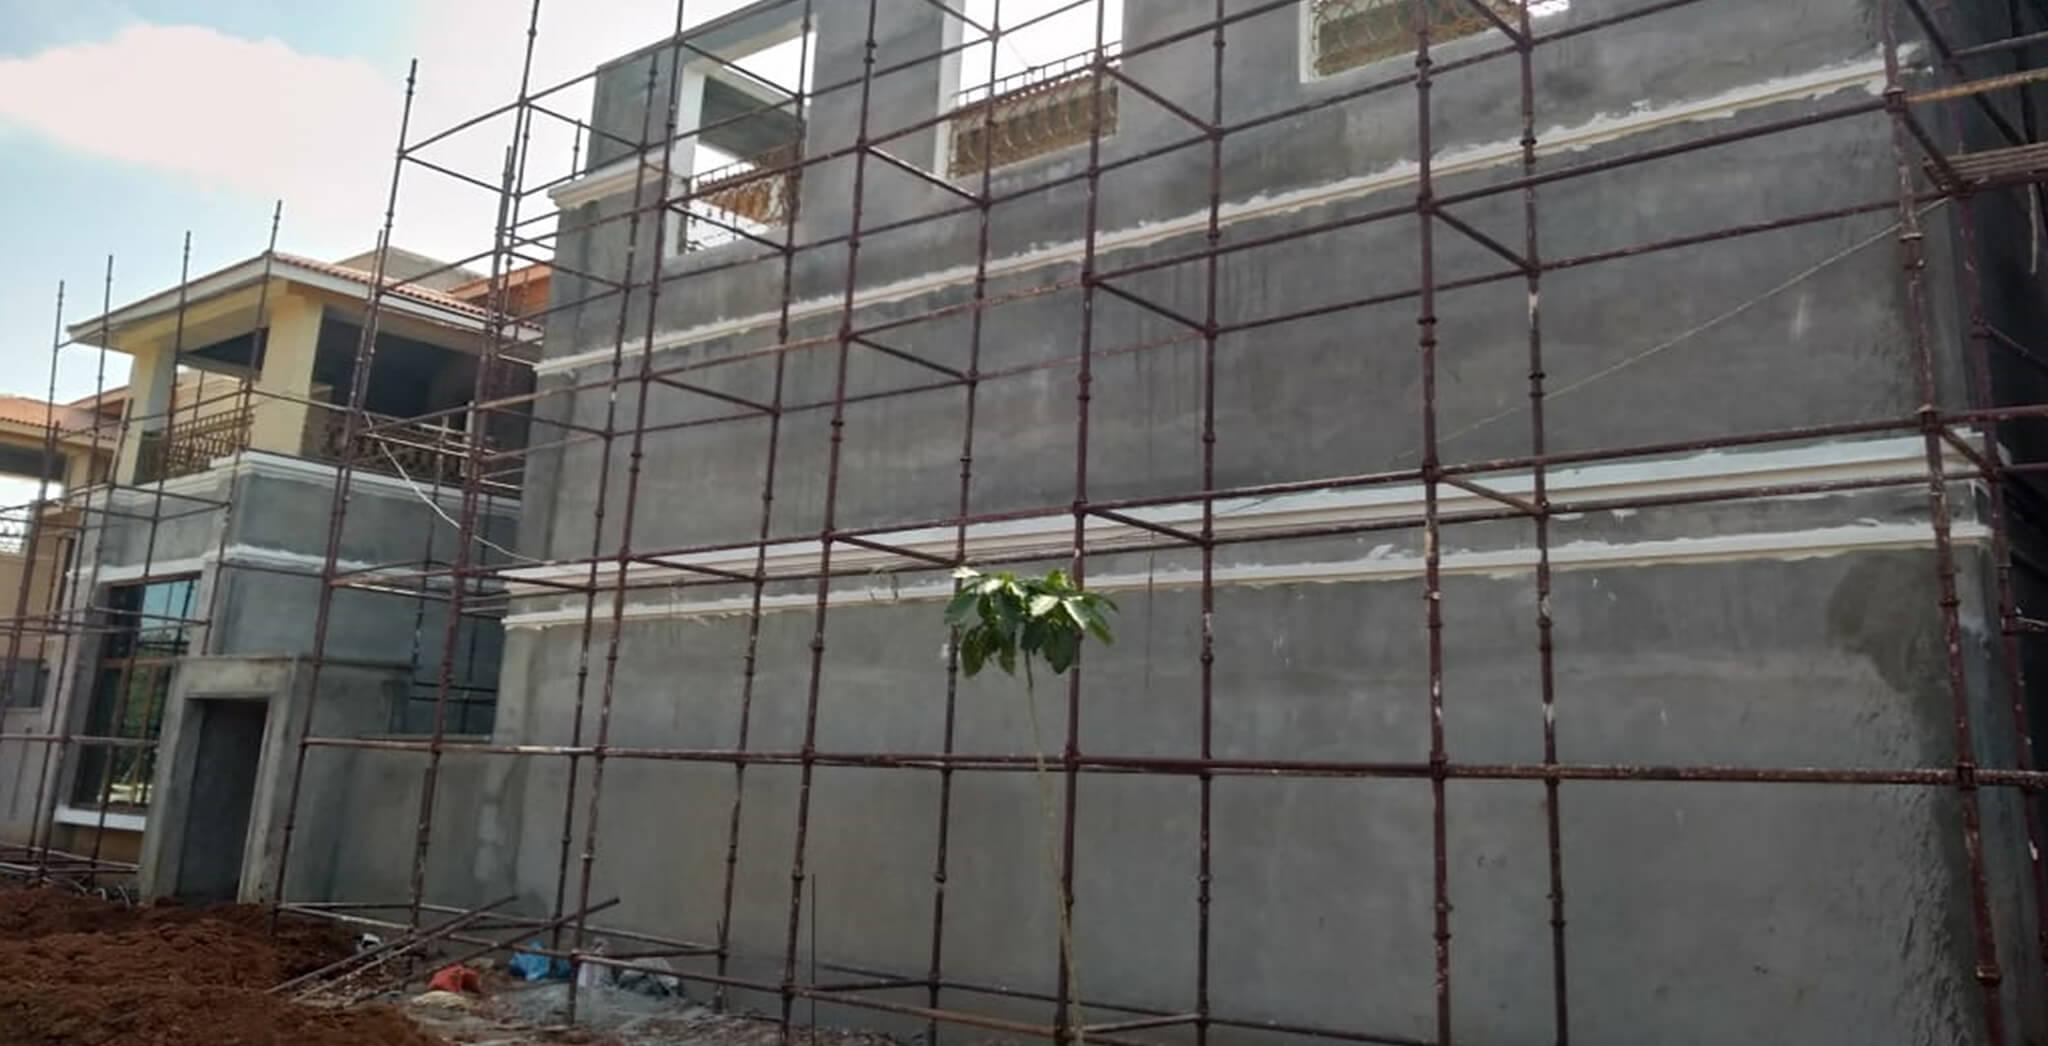 Nov 2018 - C Cluster External Painting work-in-progress